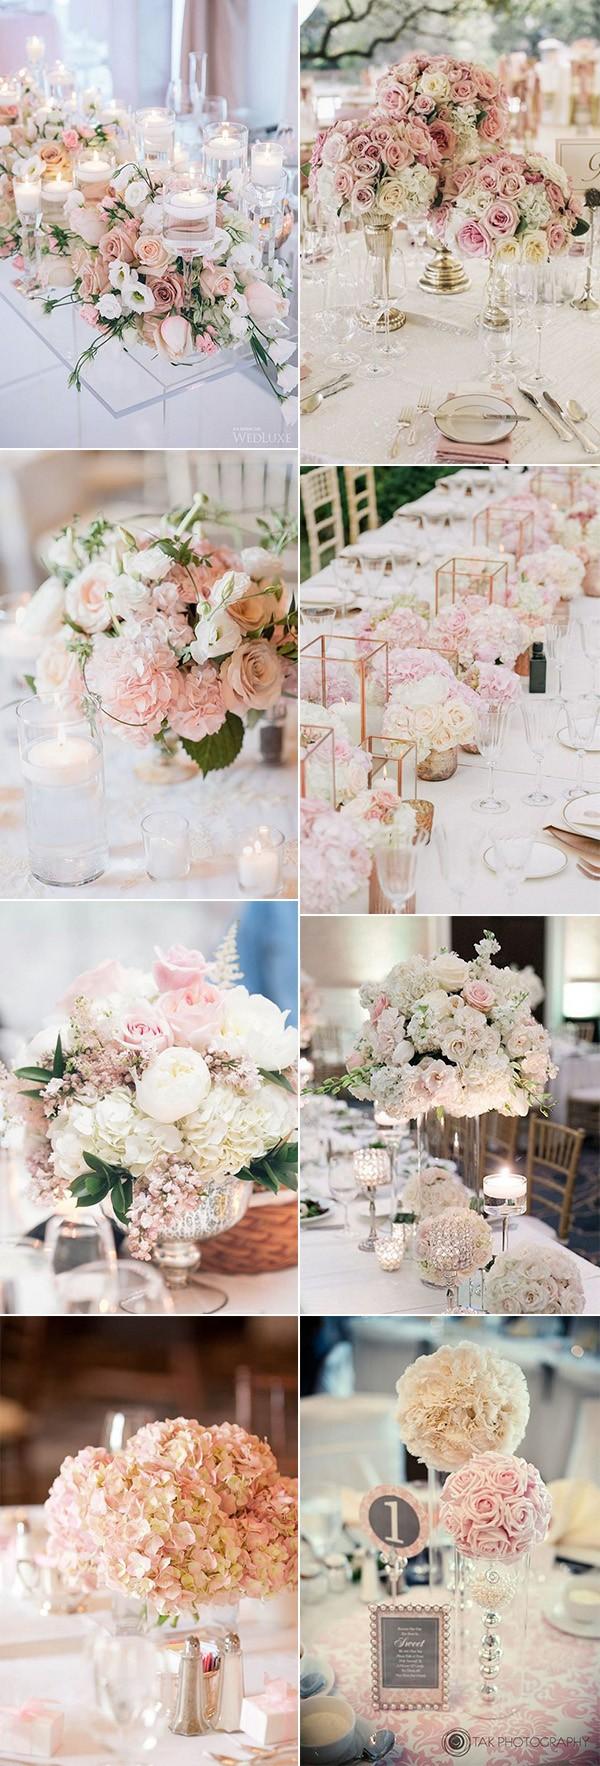 trending blush pink wedding centerpieces